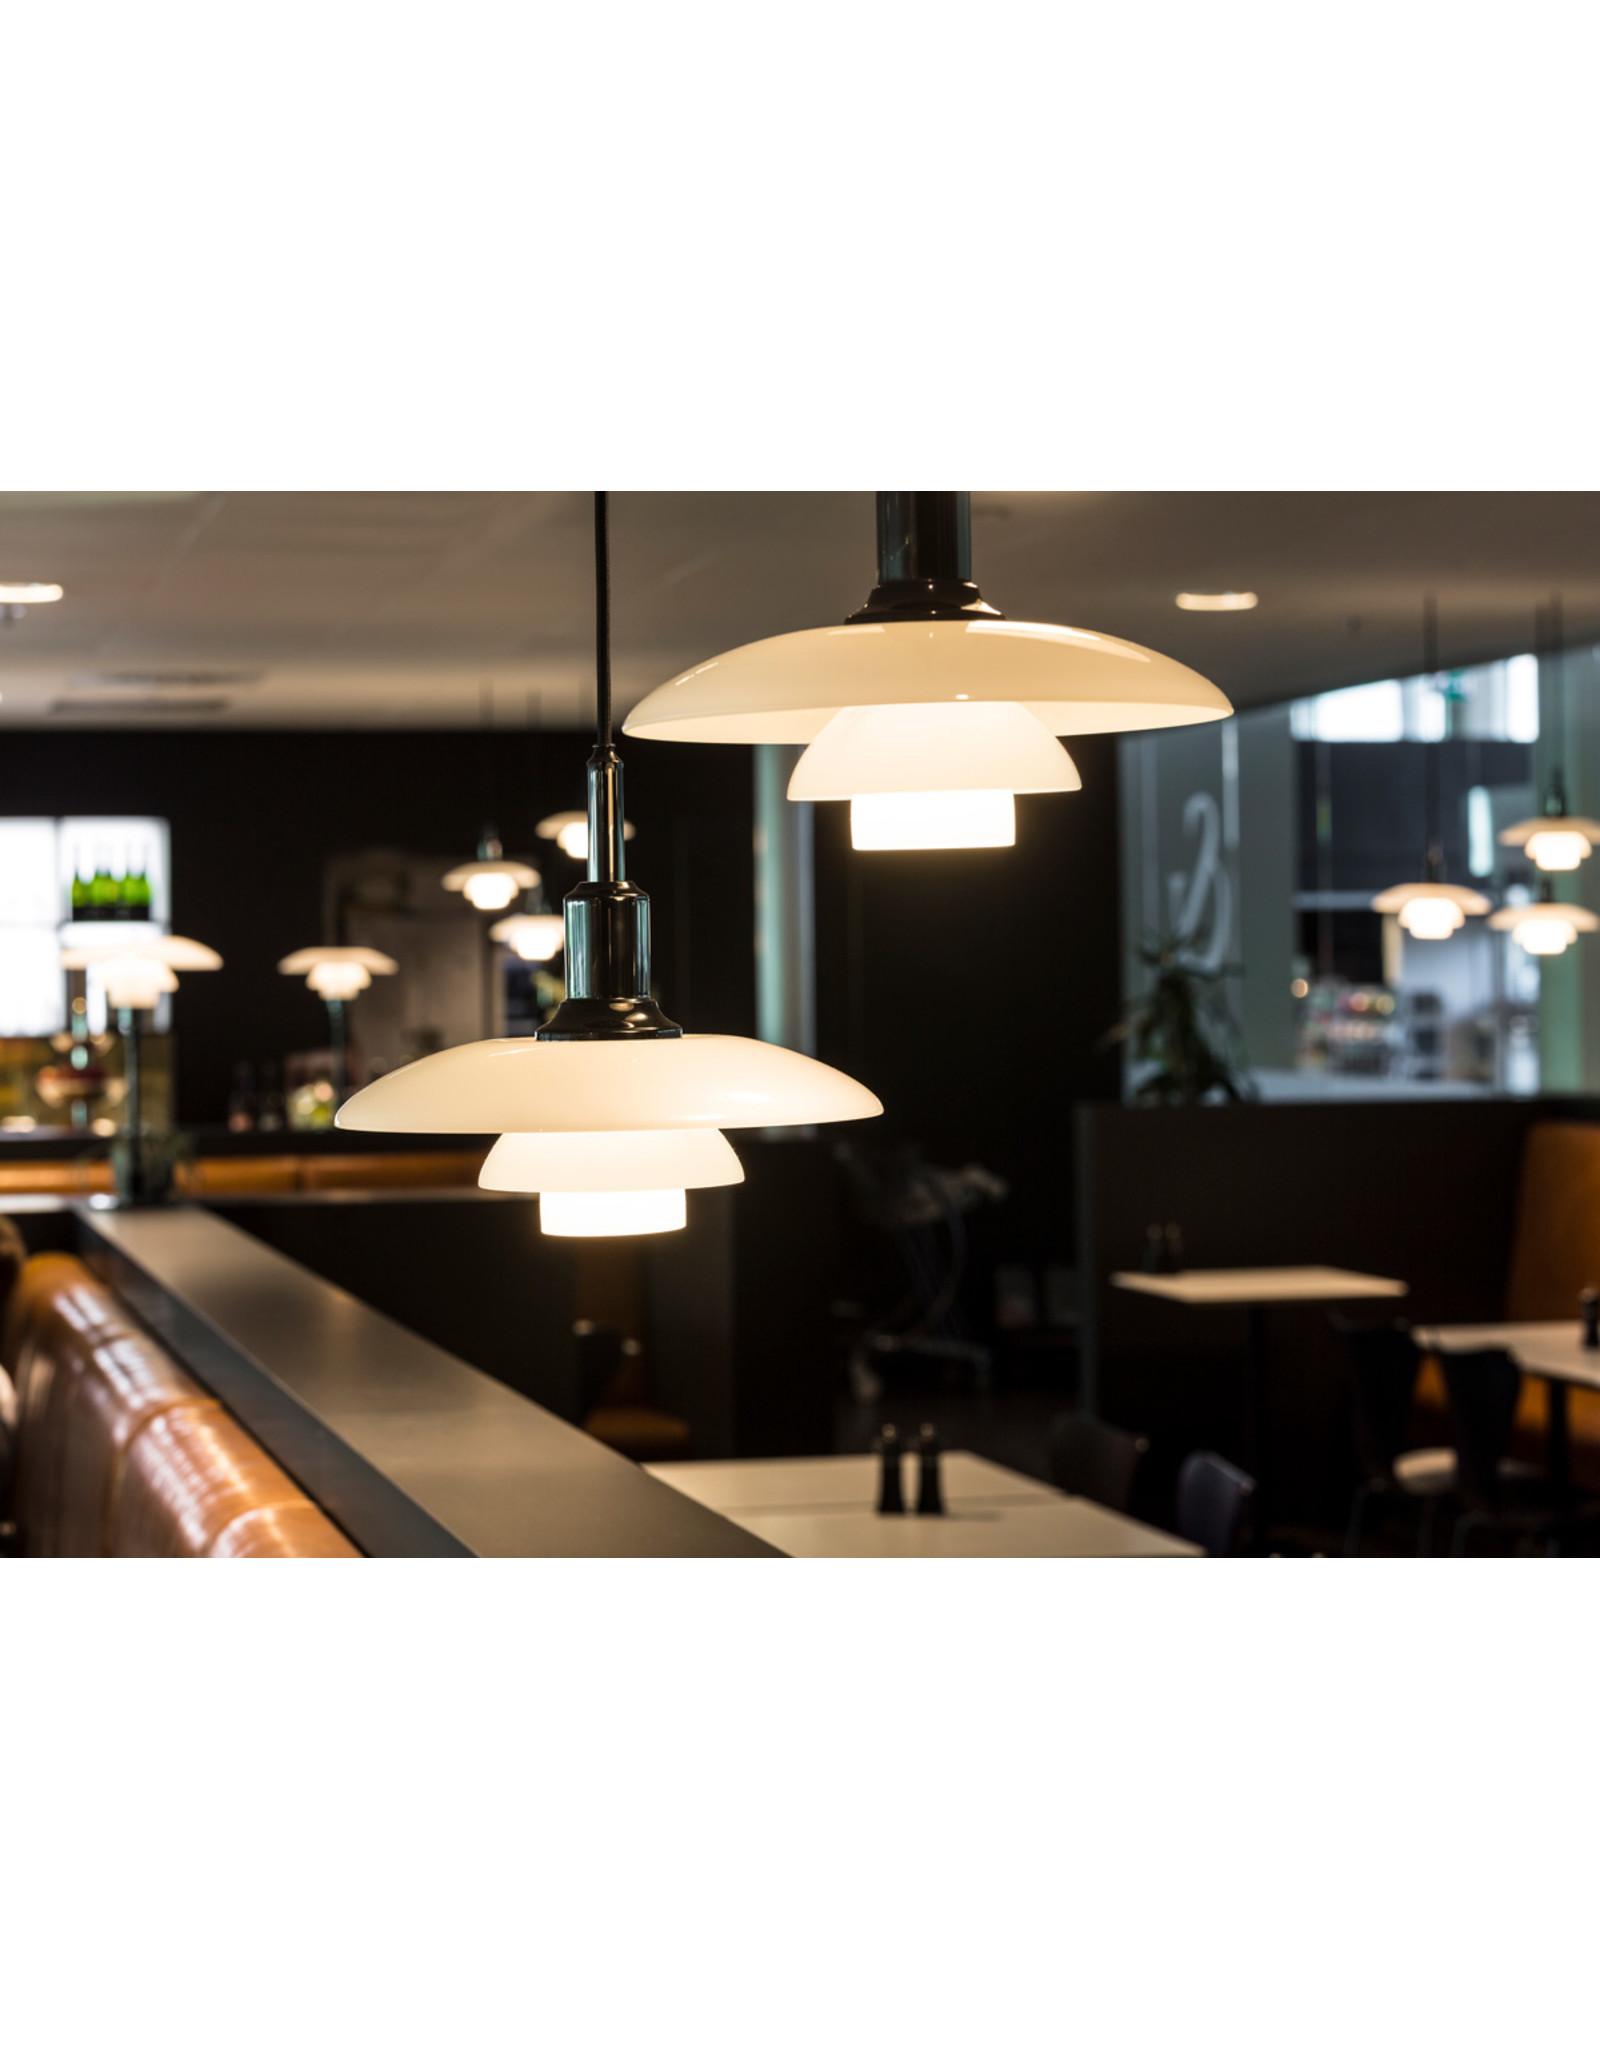 PH 3/2 PENDANT LAMP IN WHITE OPAL GLASS